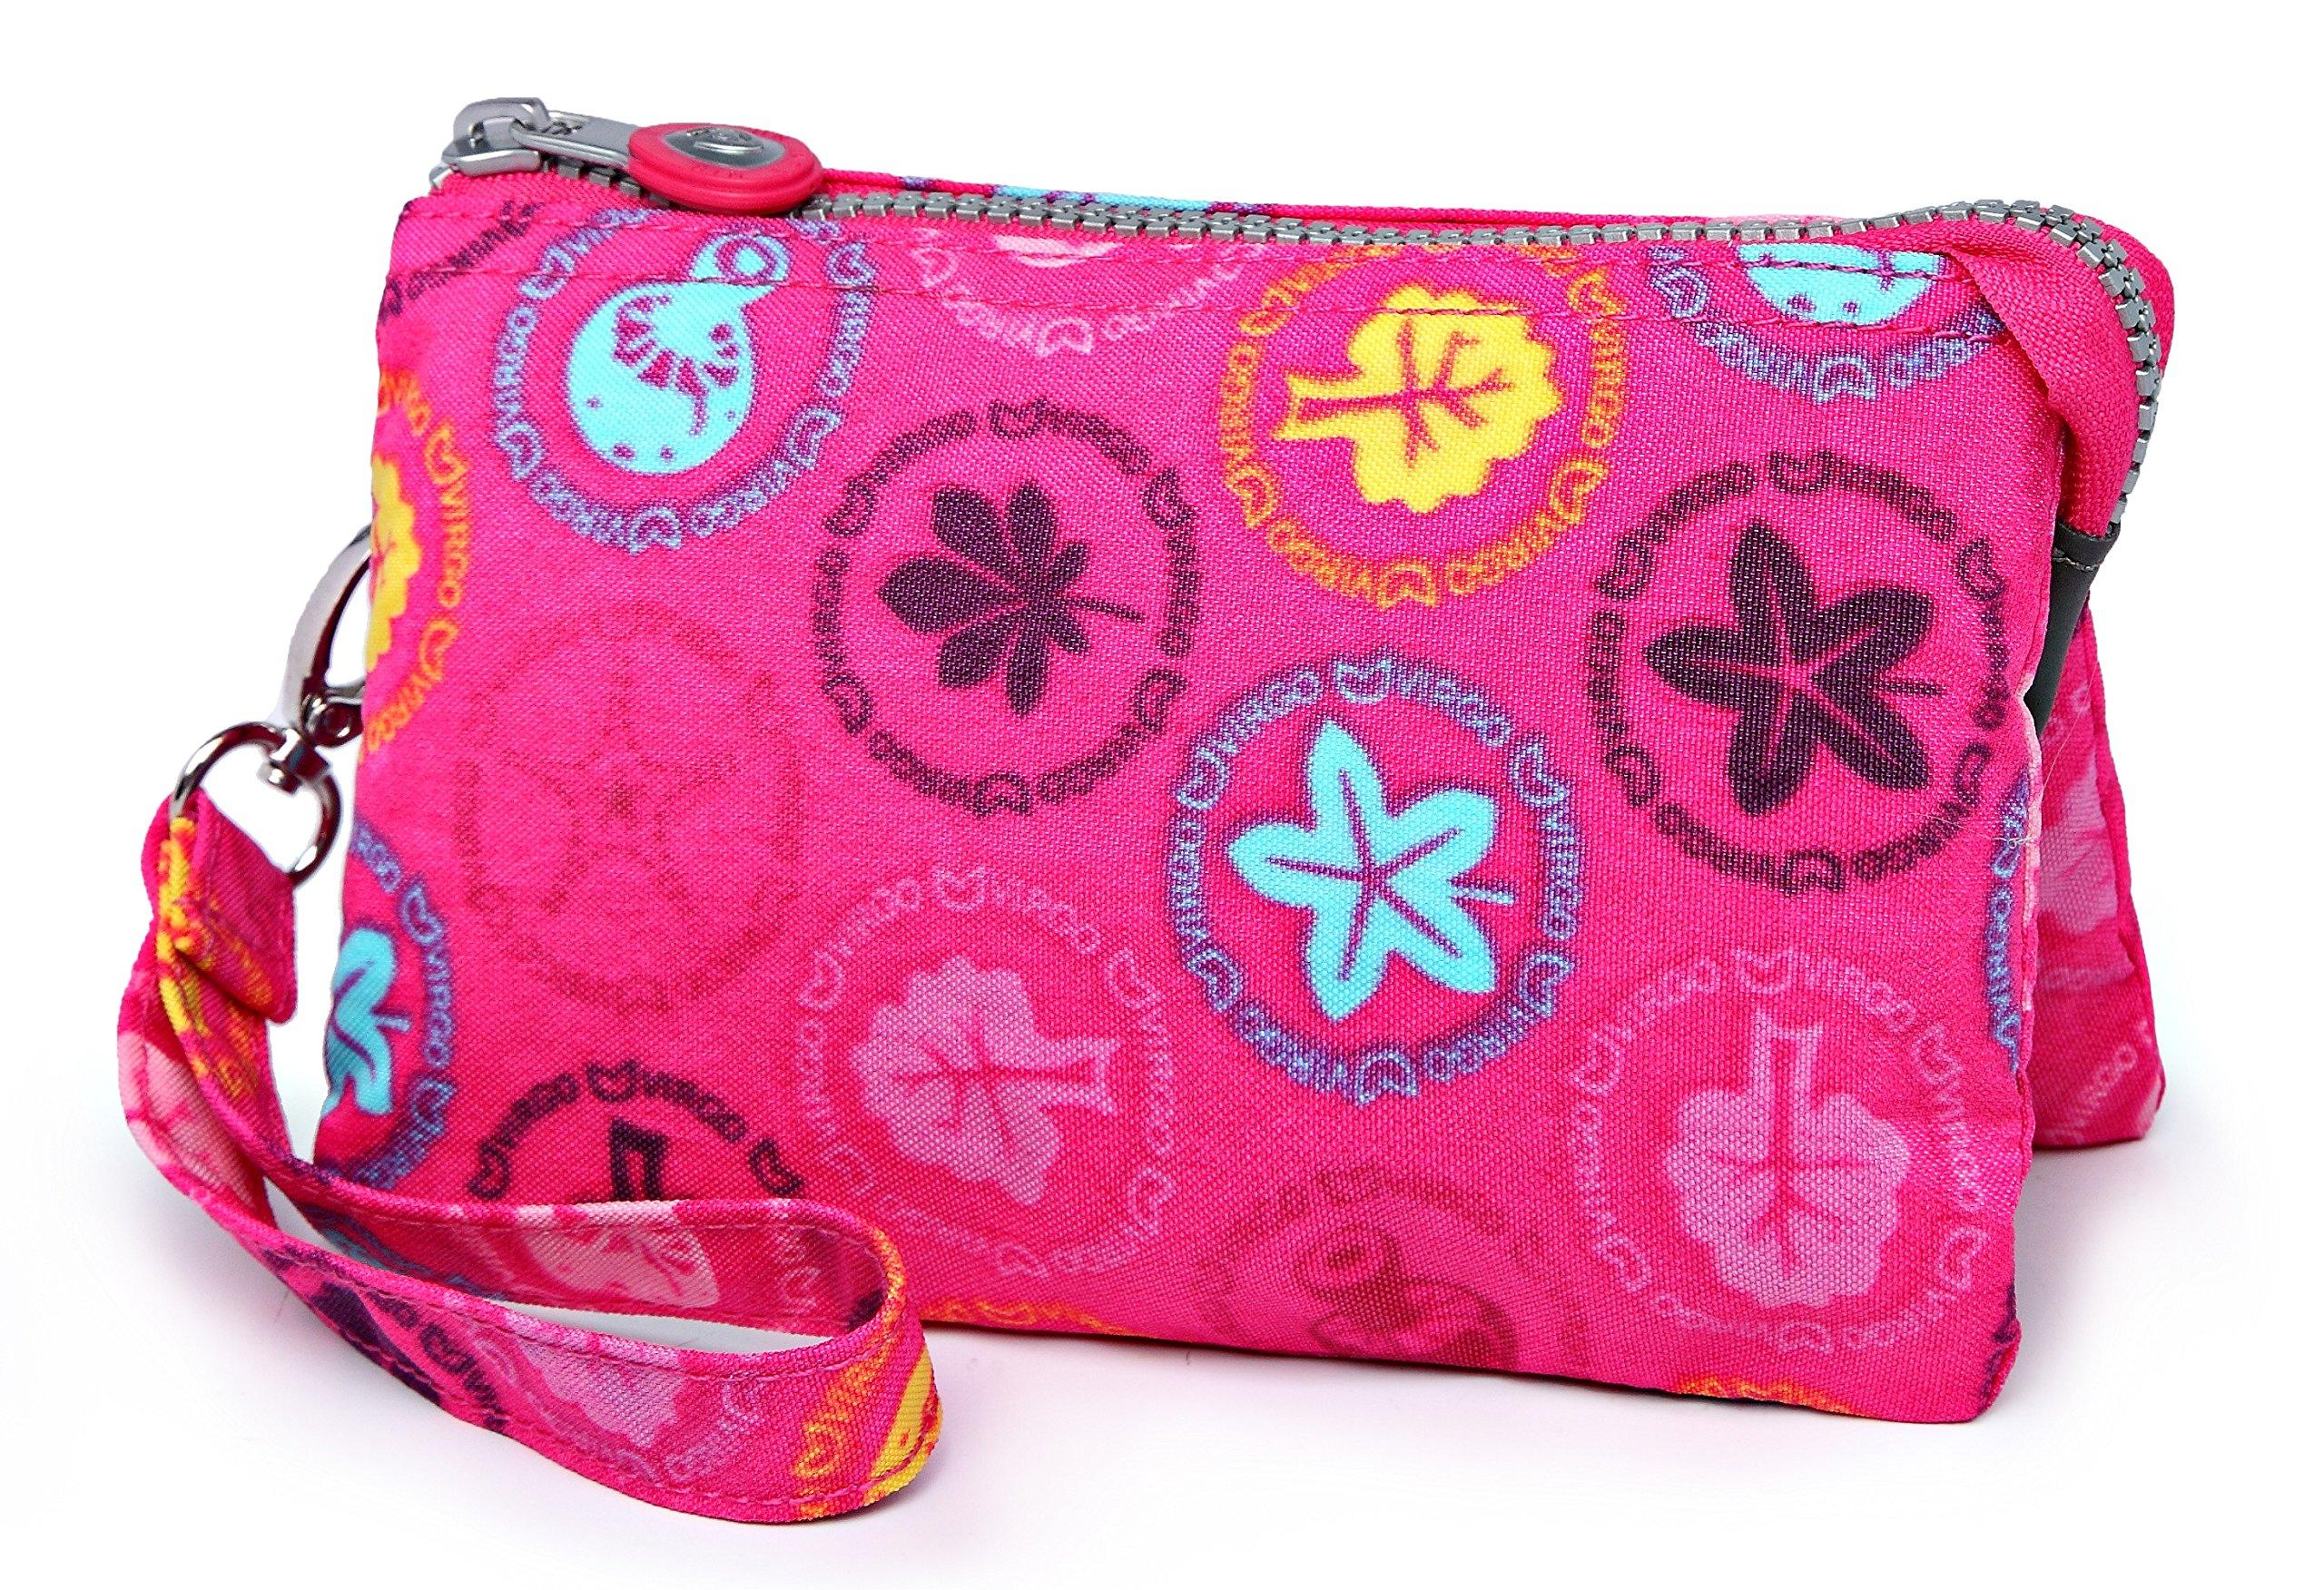 Crest Design Water Repellent Nylon Wristlet Clutch Wallet Cell Phone Pouch (Pink Wonderland)